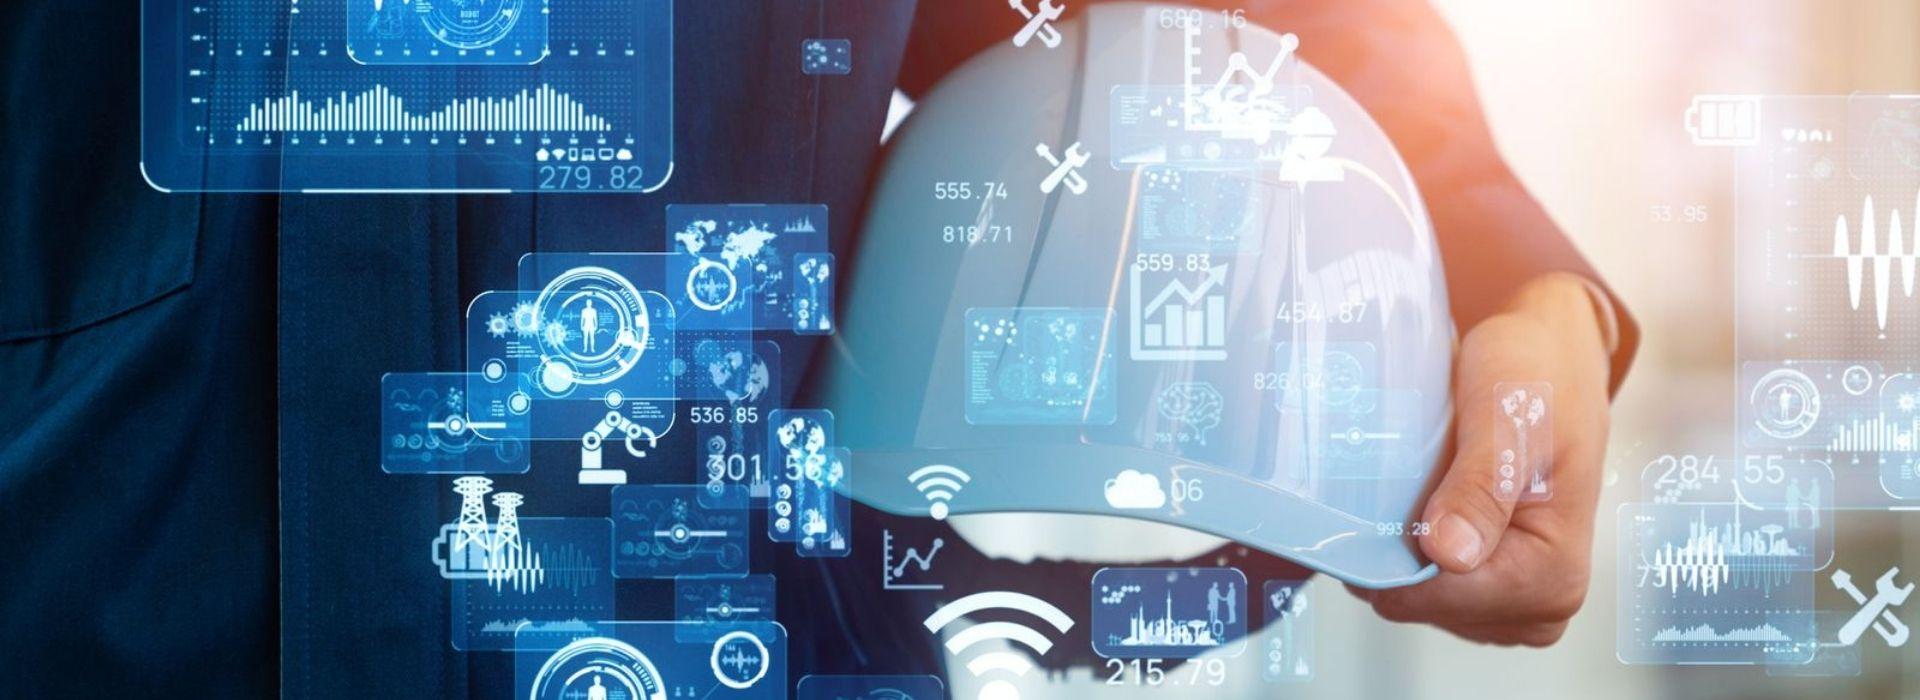 unisoma-solucoes-blog-solucao-analitica-de-inteligencia-artificial-no-setor-siderurgico-por-que-adota-la